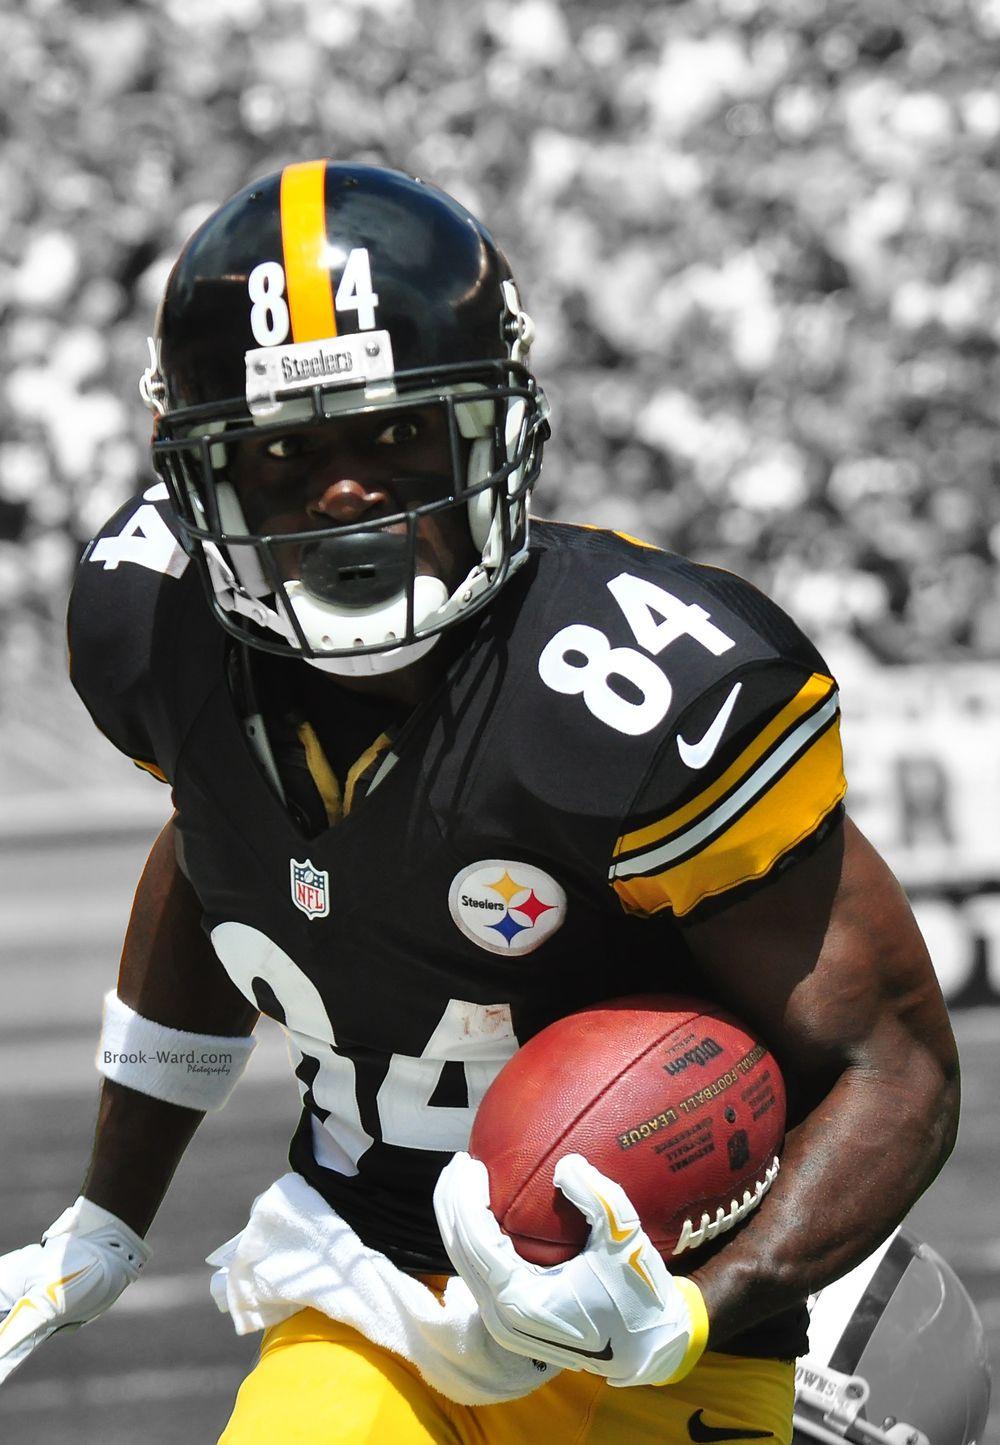 Antonio Brown Pictures 6 Jpg 1000 1445 Antonio Brown Pittsburg Steelers Antonio Brown Steelers